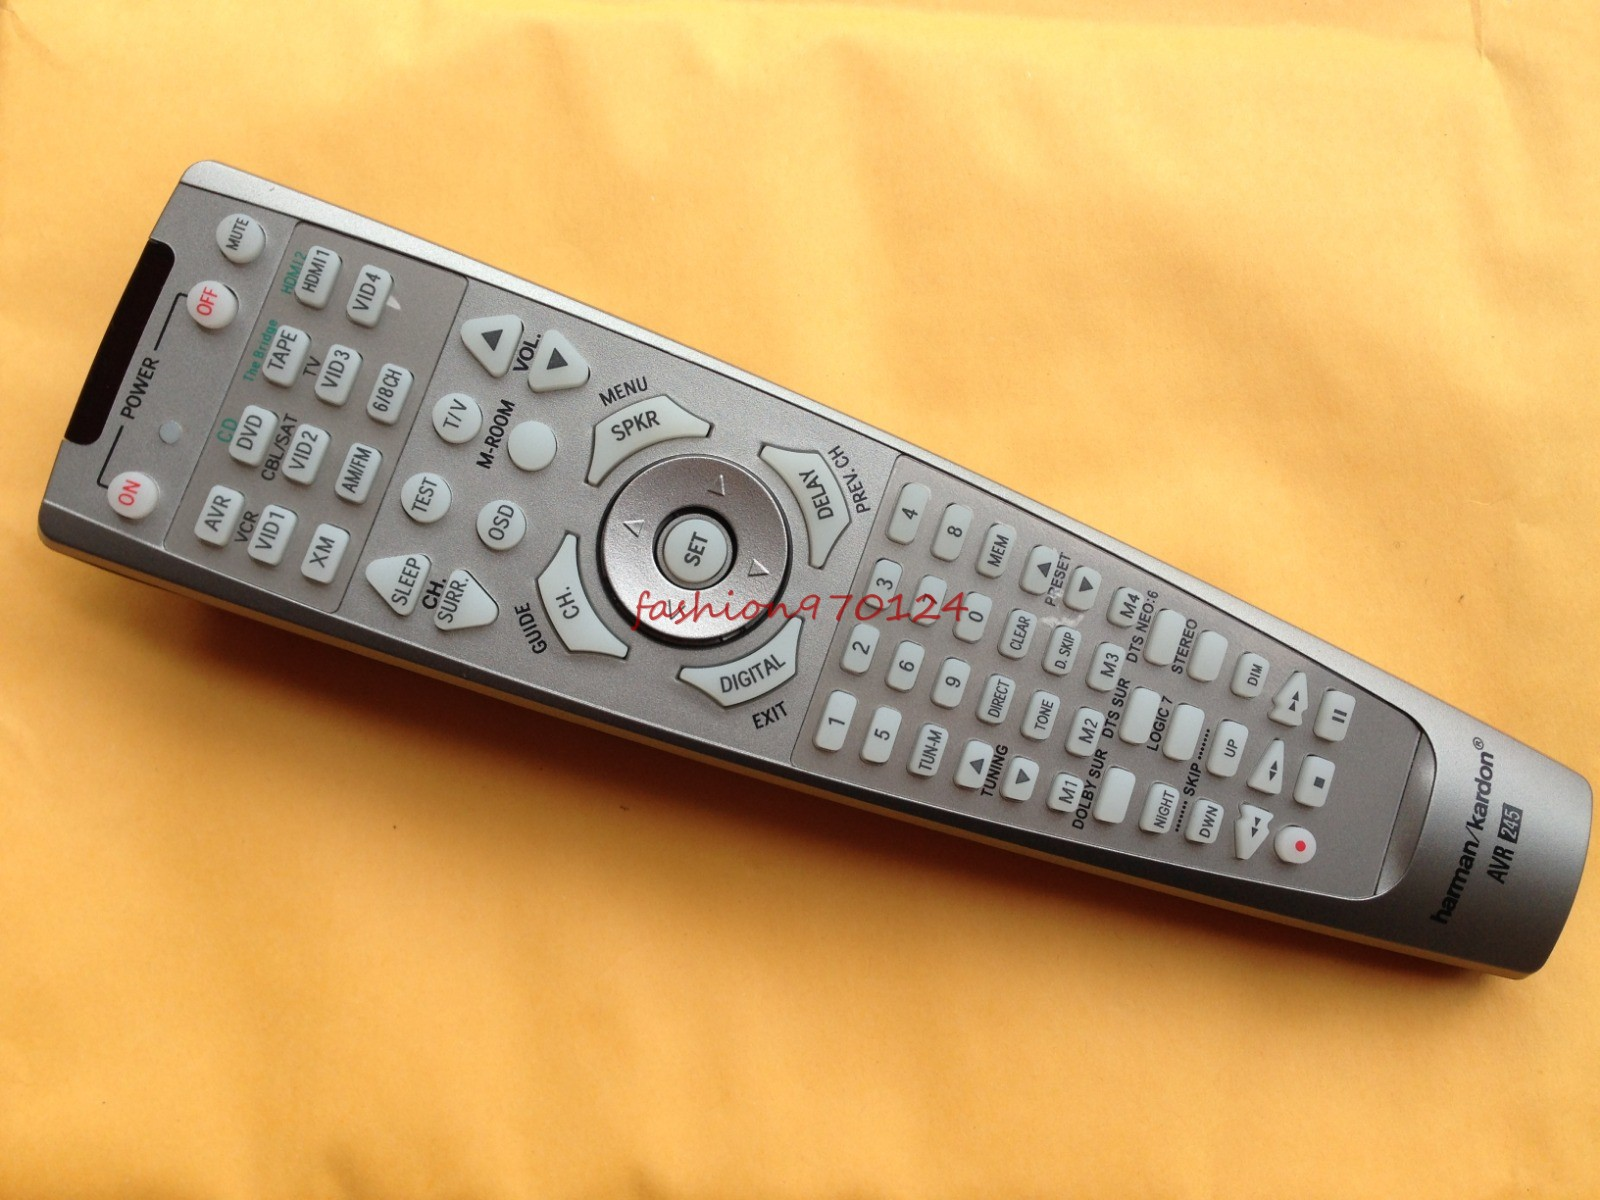 Harman Kardon Universal Remote Related Keywords & Suggestions